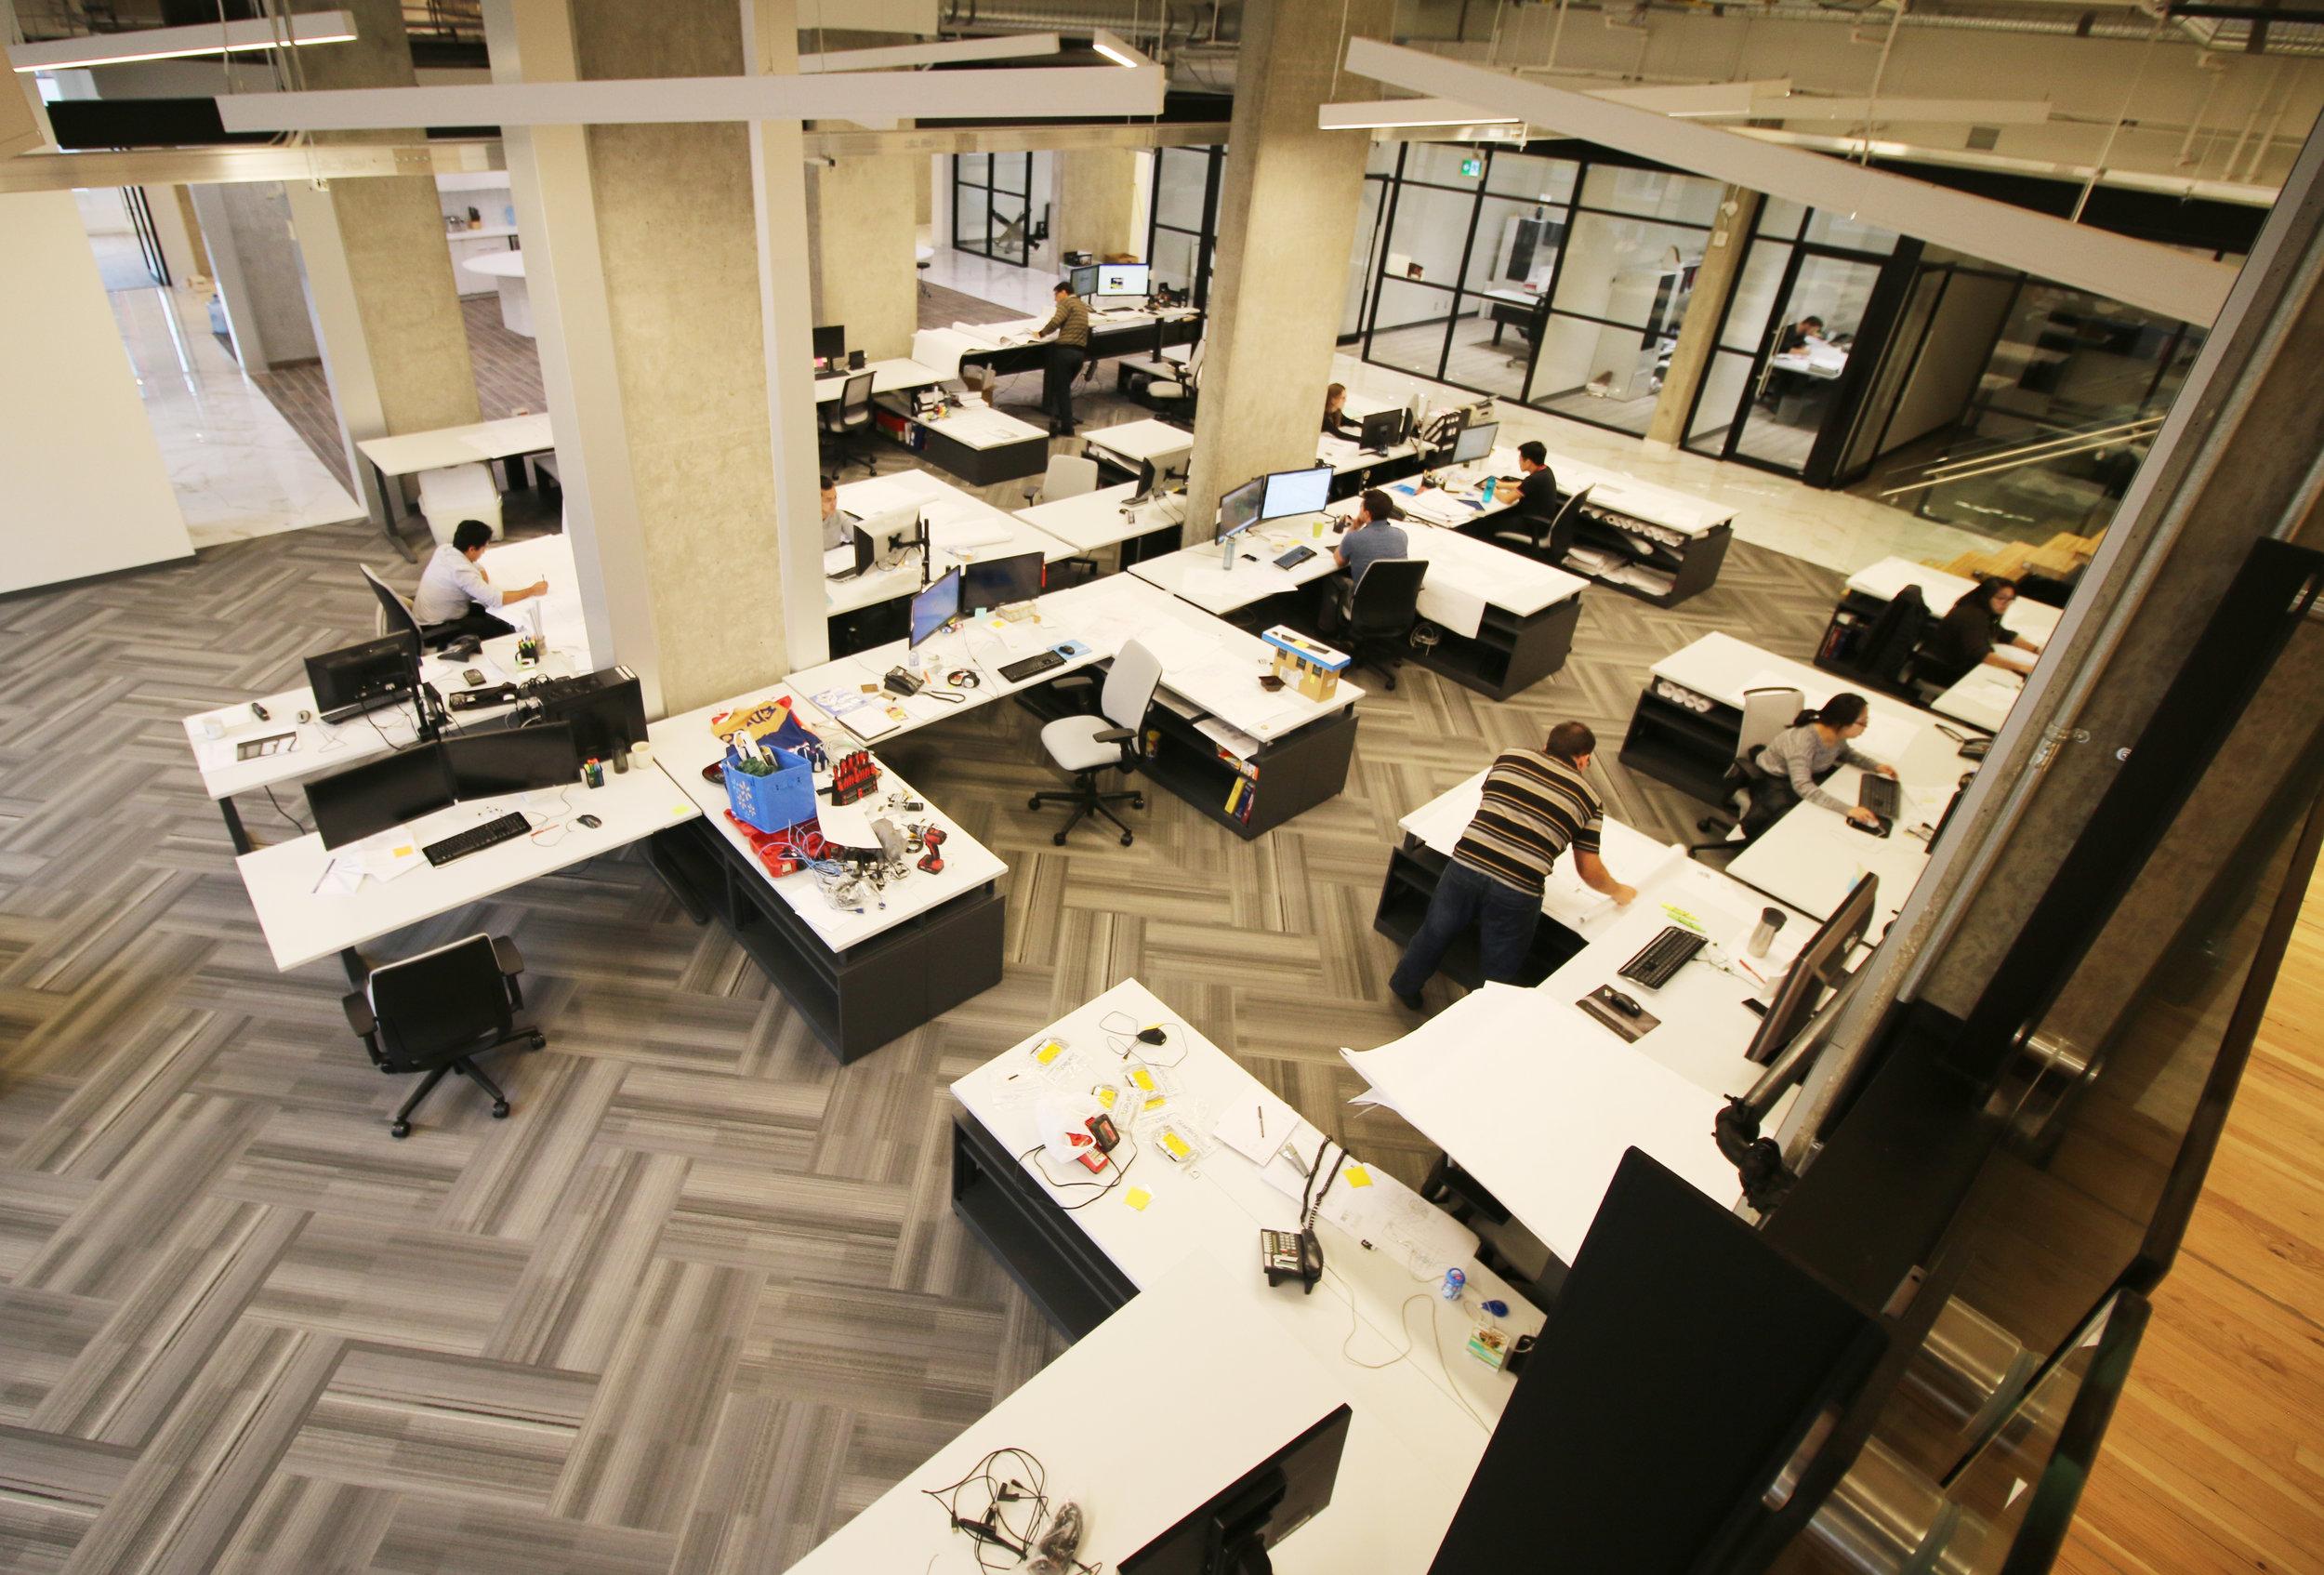 Engineering studio from Mezzanine